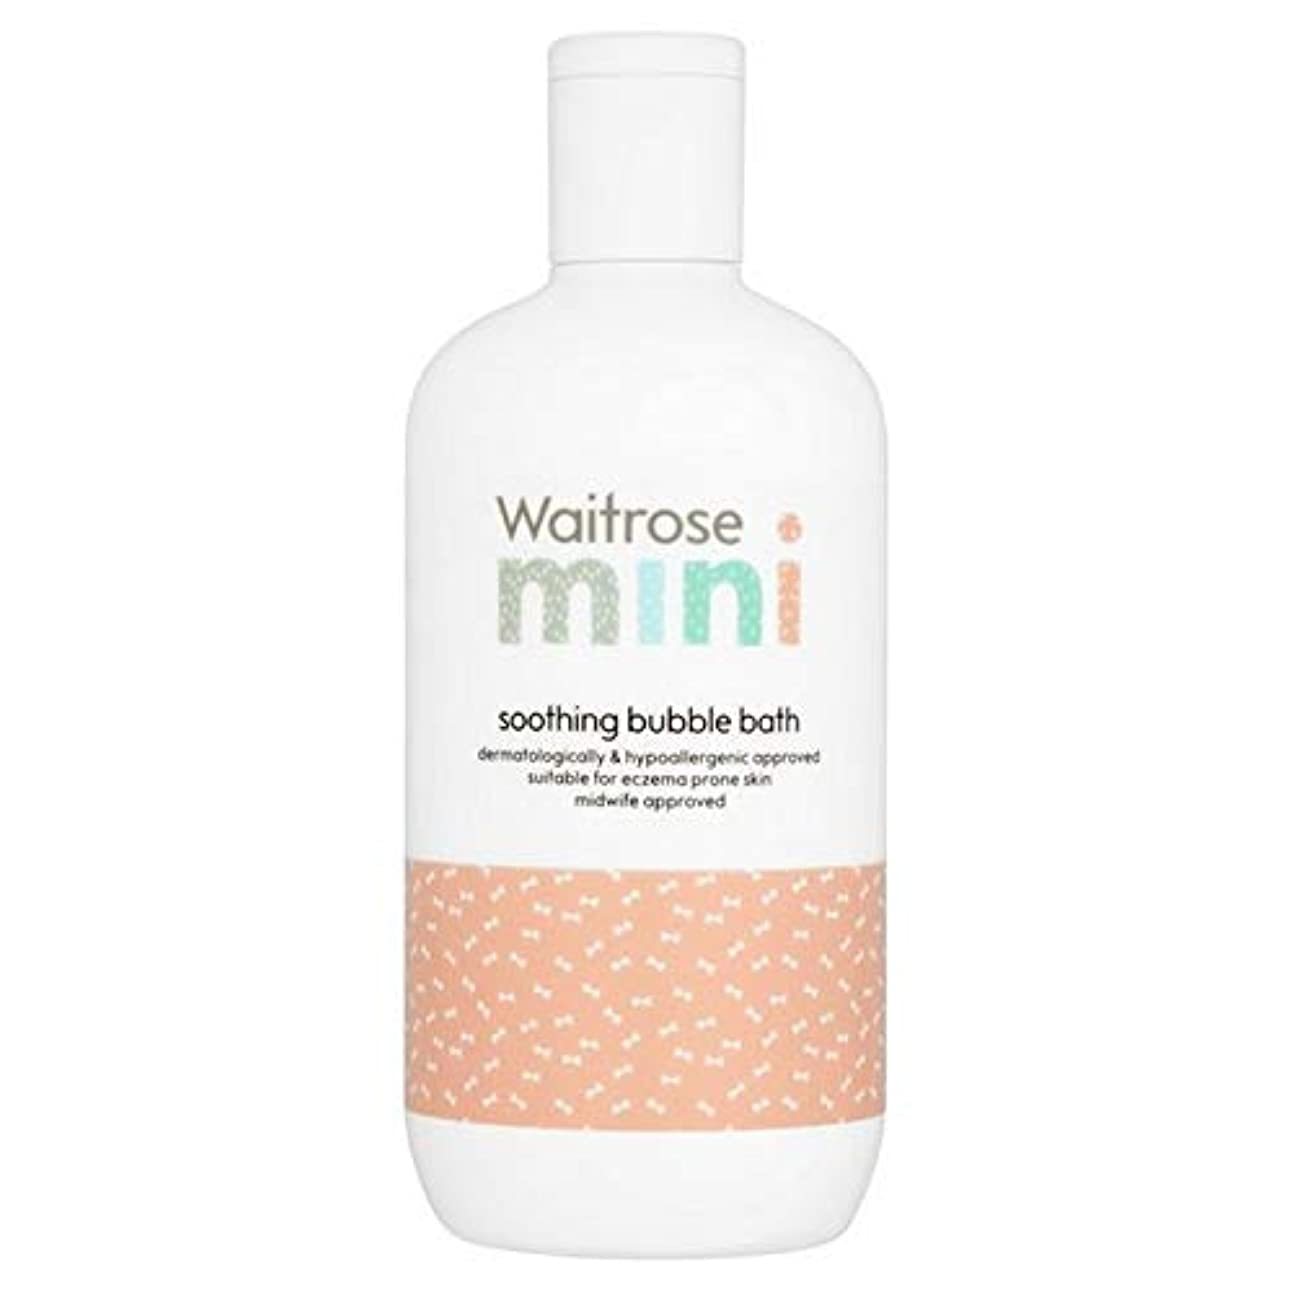 [Waitrose ] ウェイトローズミニなだめるベビー泡風呂の400ミリリットル - Waitrose Mini Soothing Baby Bubble Bath 400ml [並行輸入品]